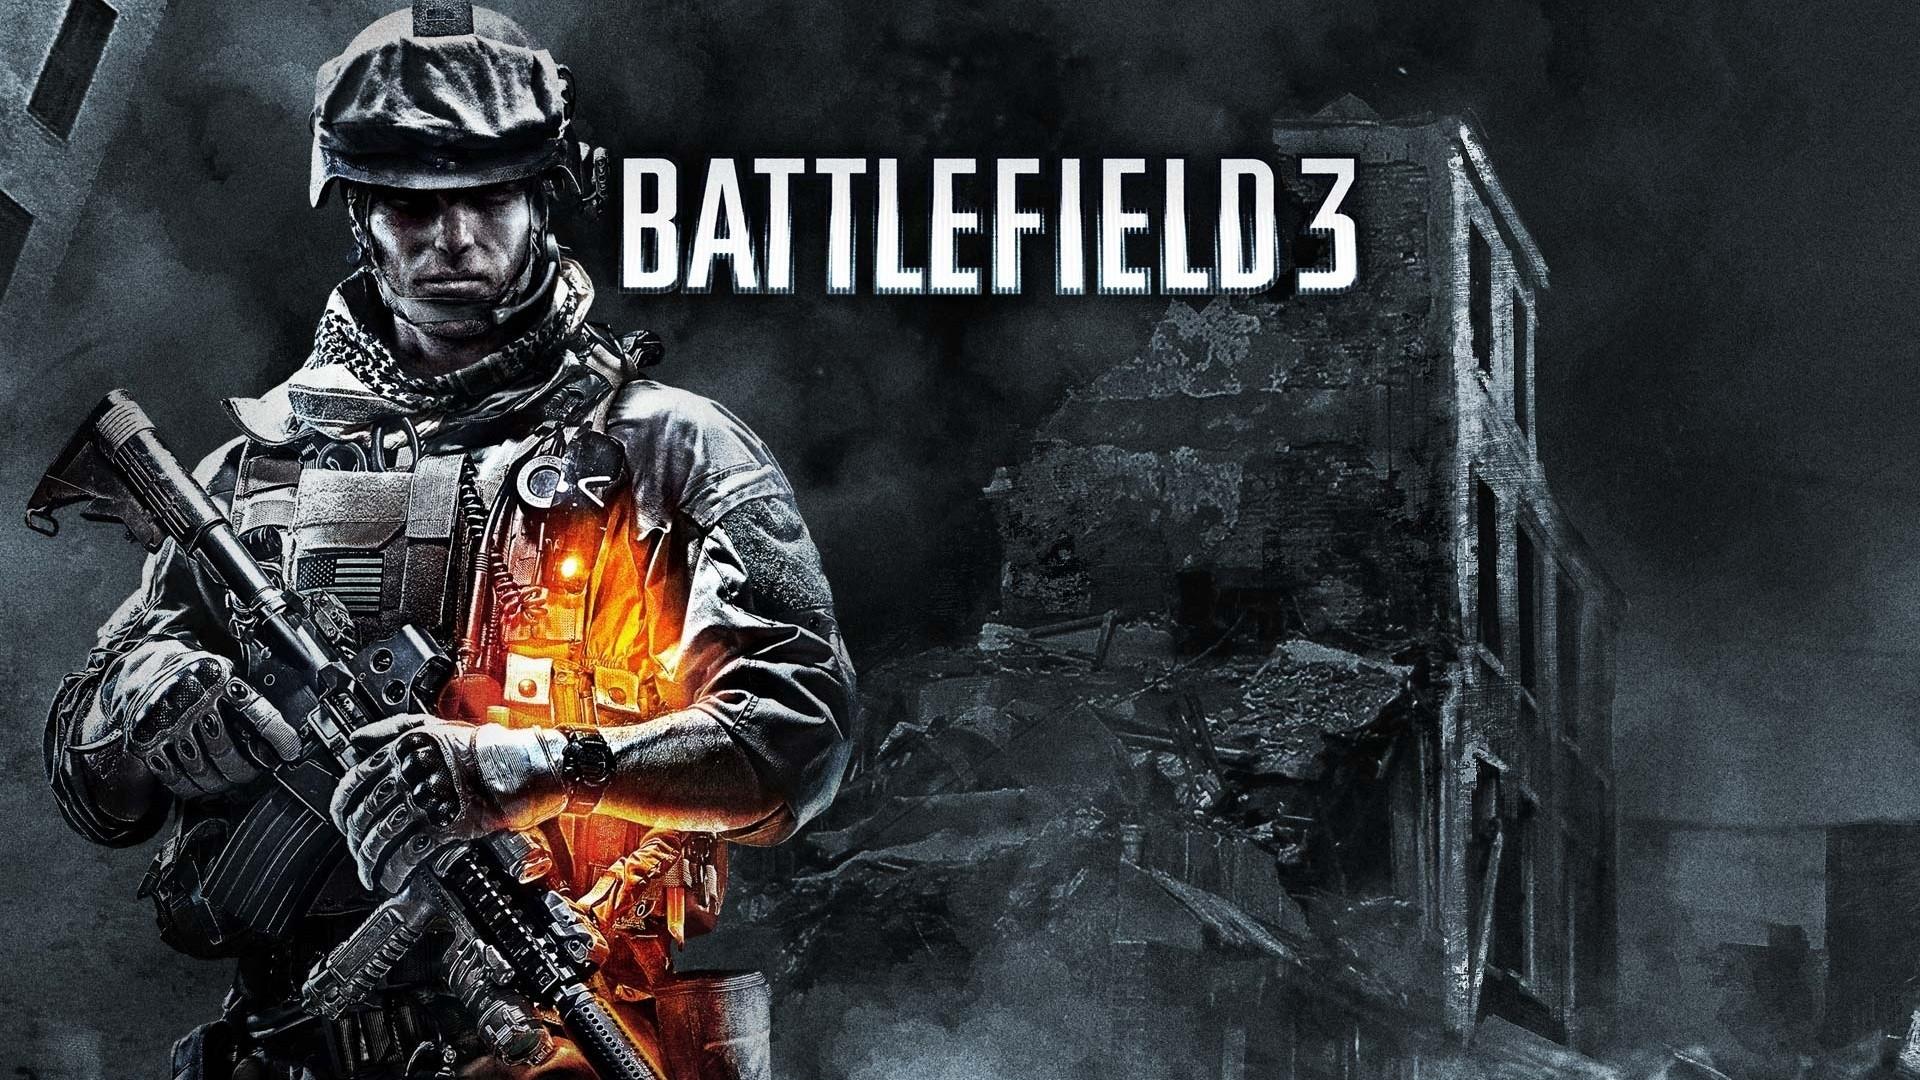 Battlefield 3 Wallpaper 1080p 79 Images